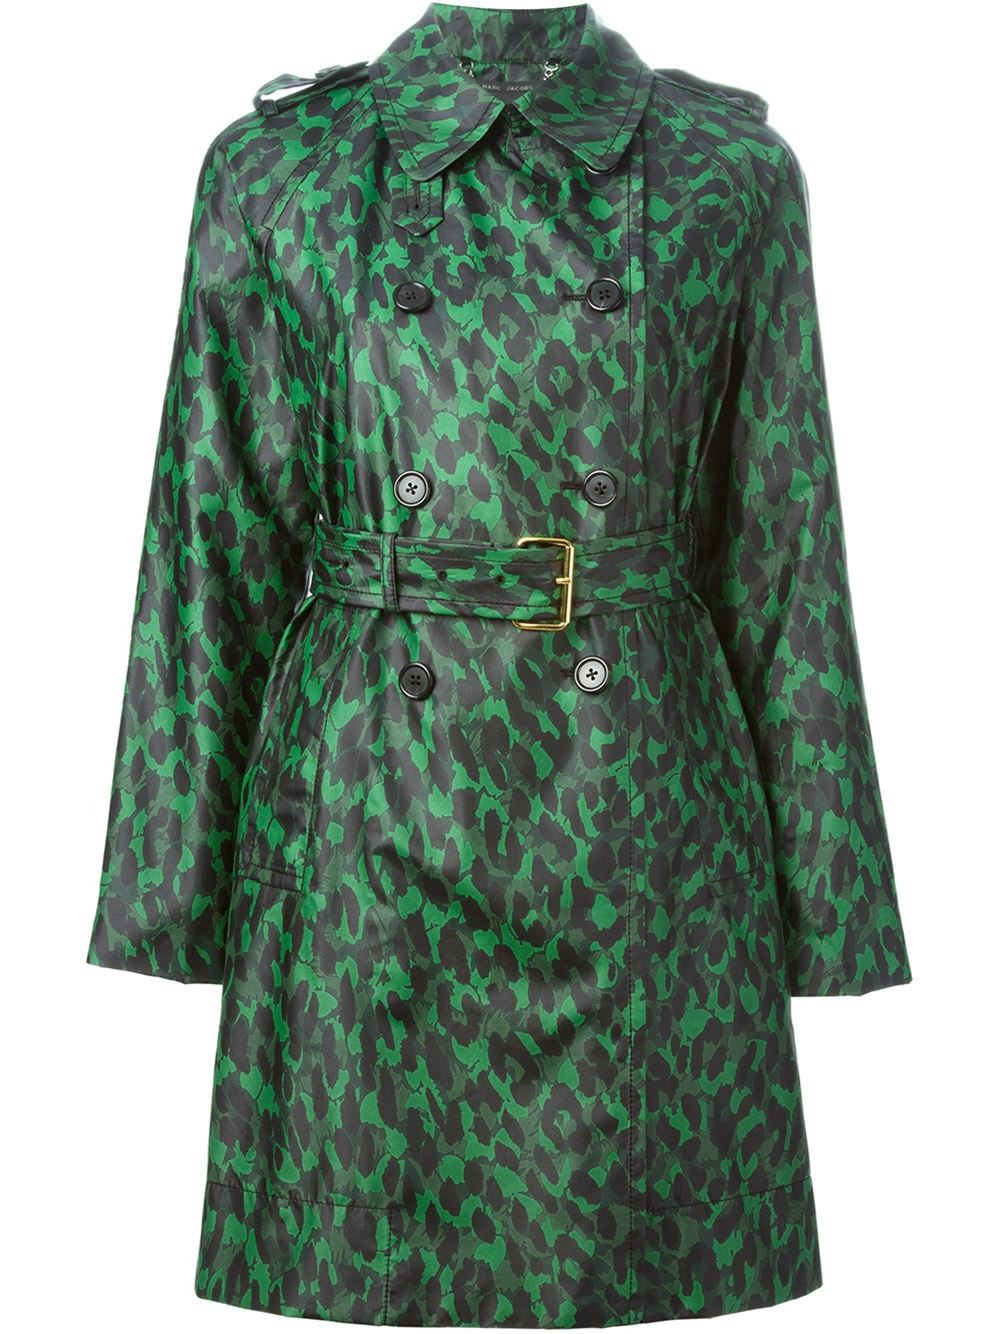 marc jacobs leopard print rain coat in green lyst. Black Bedroom Furniture Sets. Home Design Ideas